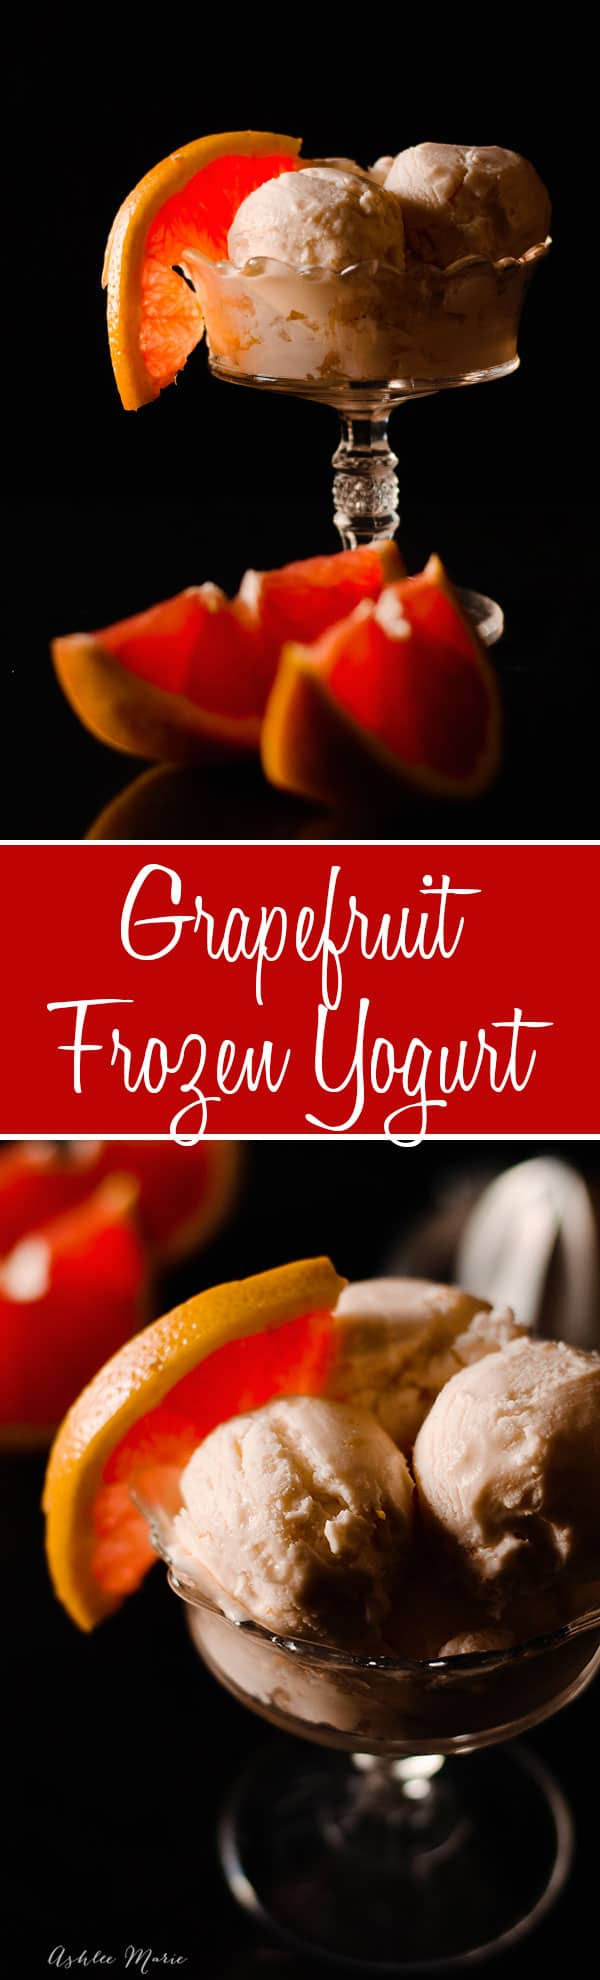 I love frozen yogurt and one of my favorites is this grapefruit frozen yogurt, it's sweet, tart and creamy, a wonderful recipe